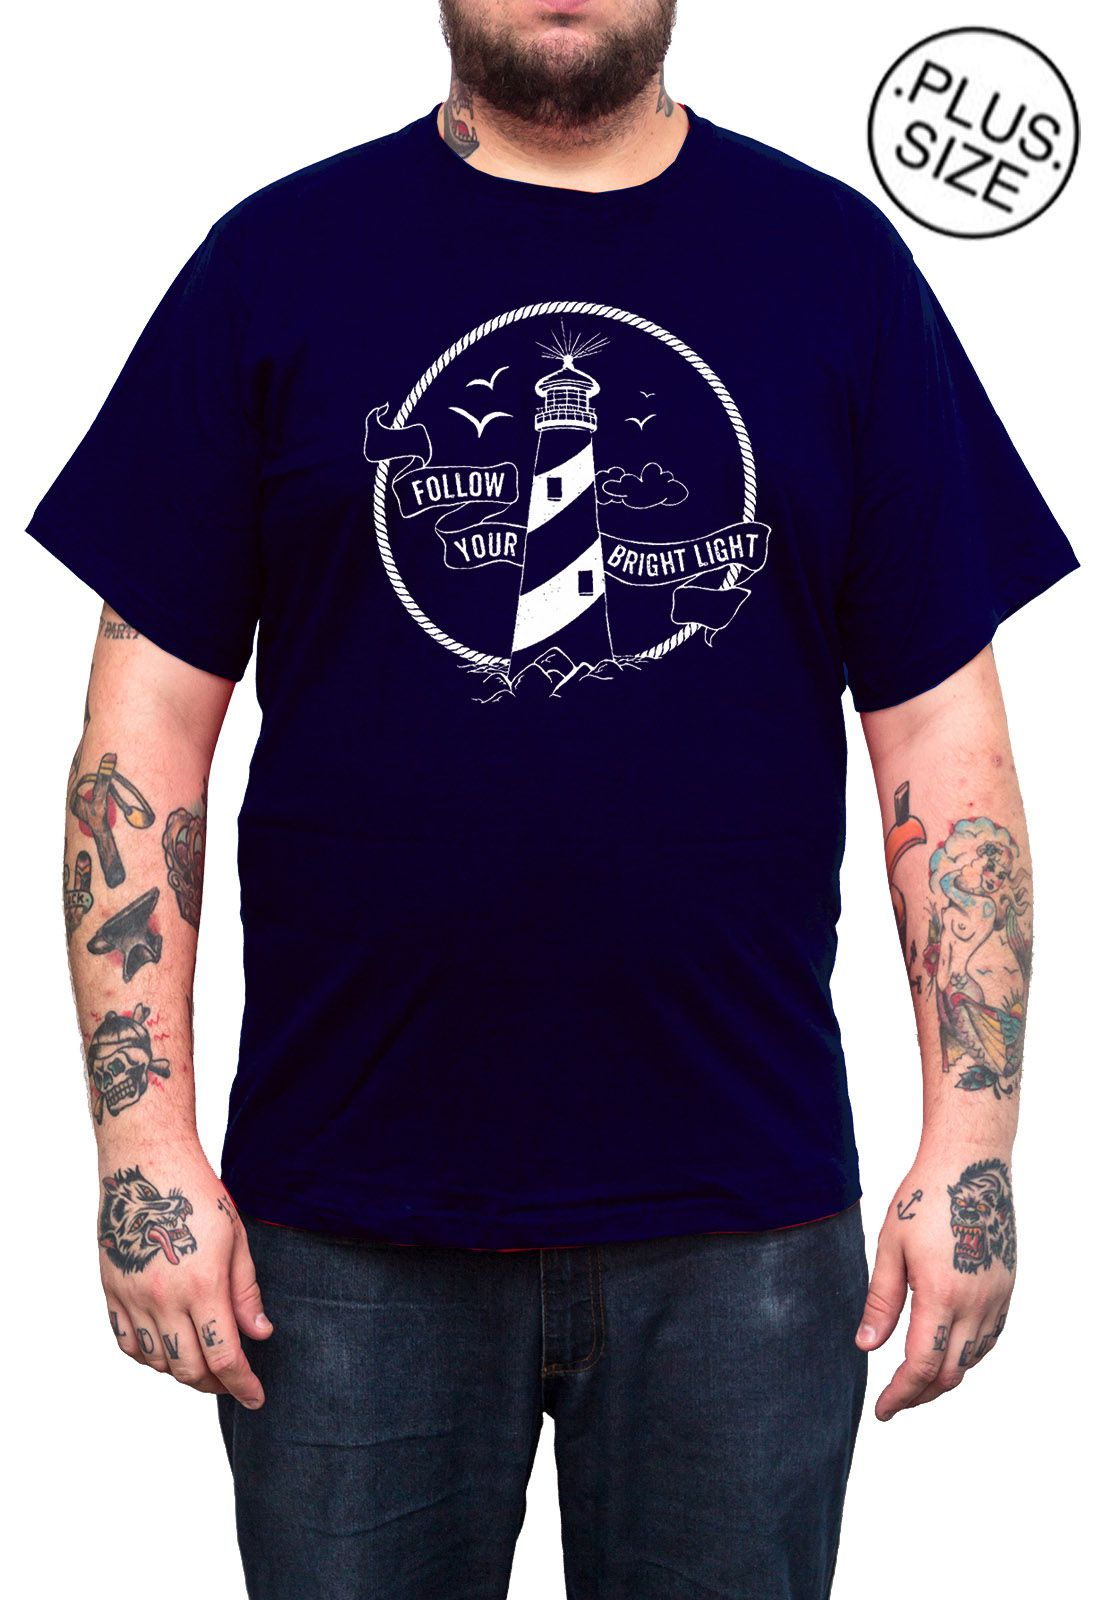 Camiseta Holdfast Follow Your Light - Azul Marinho - Plus Size - Tamanho Grande XG  - HShop